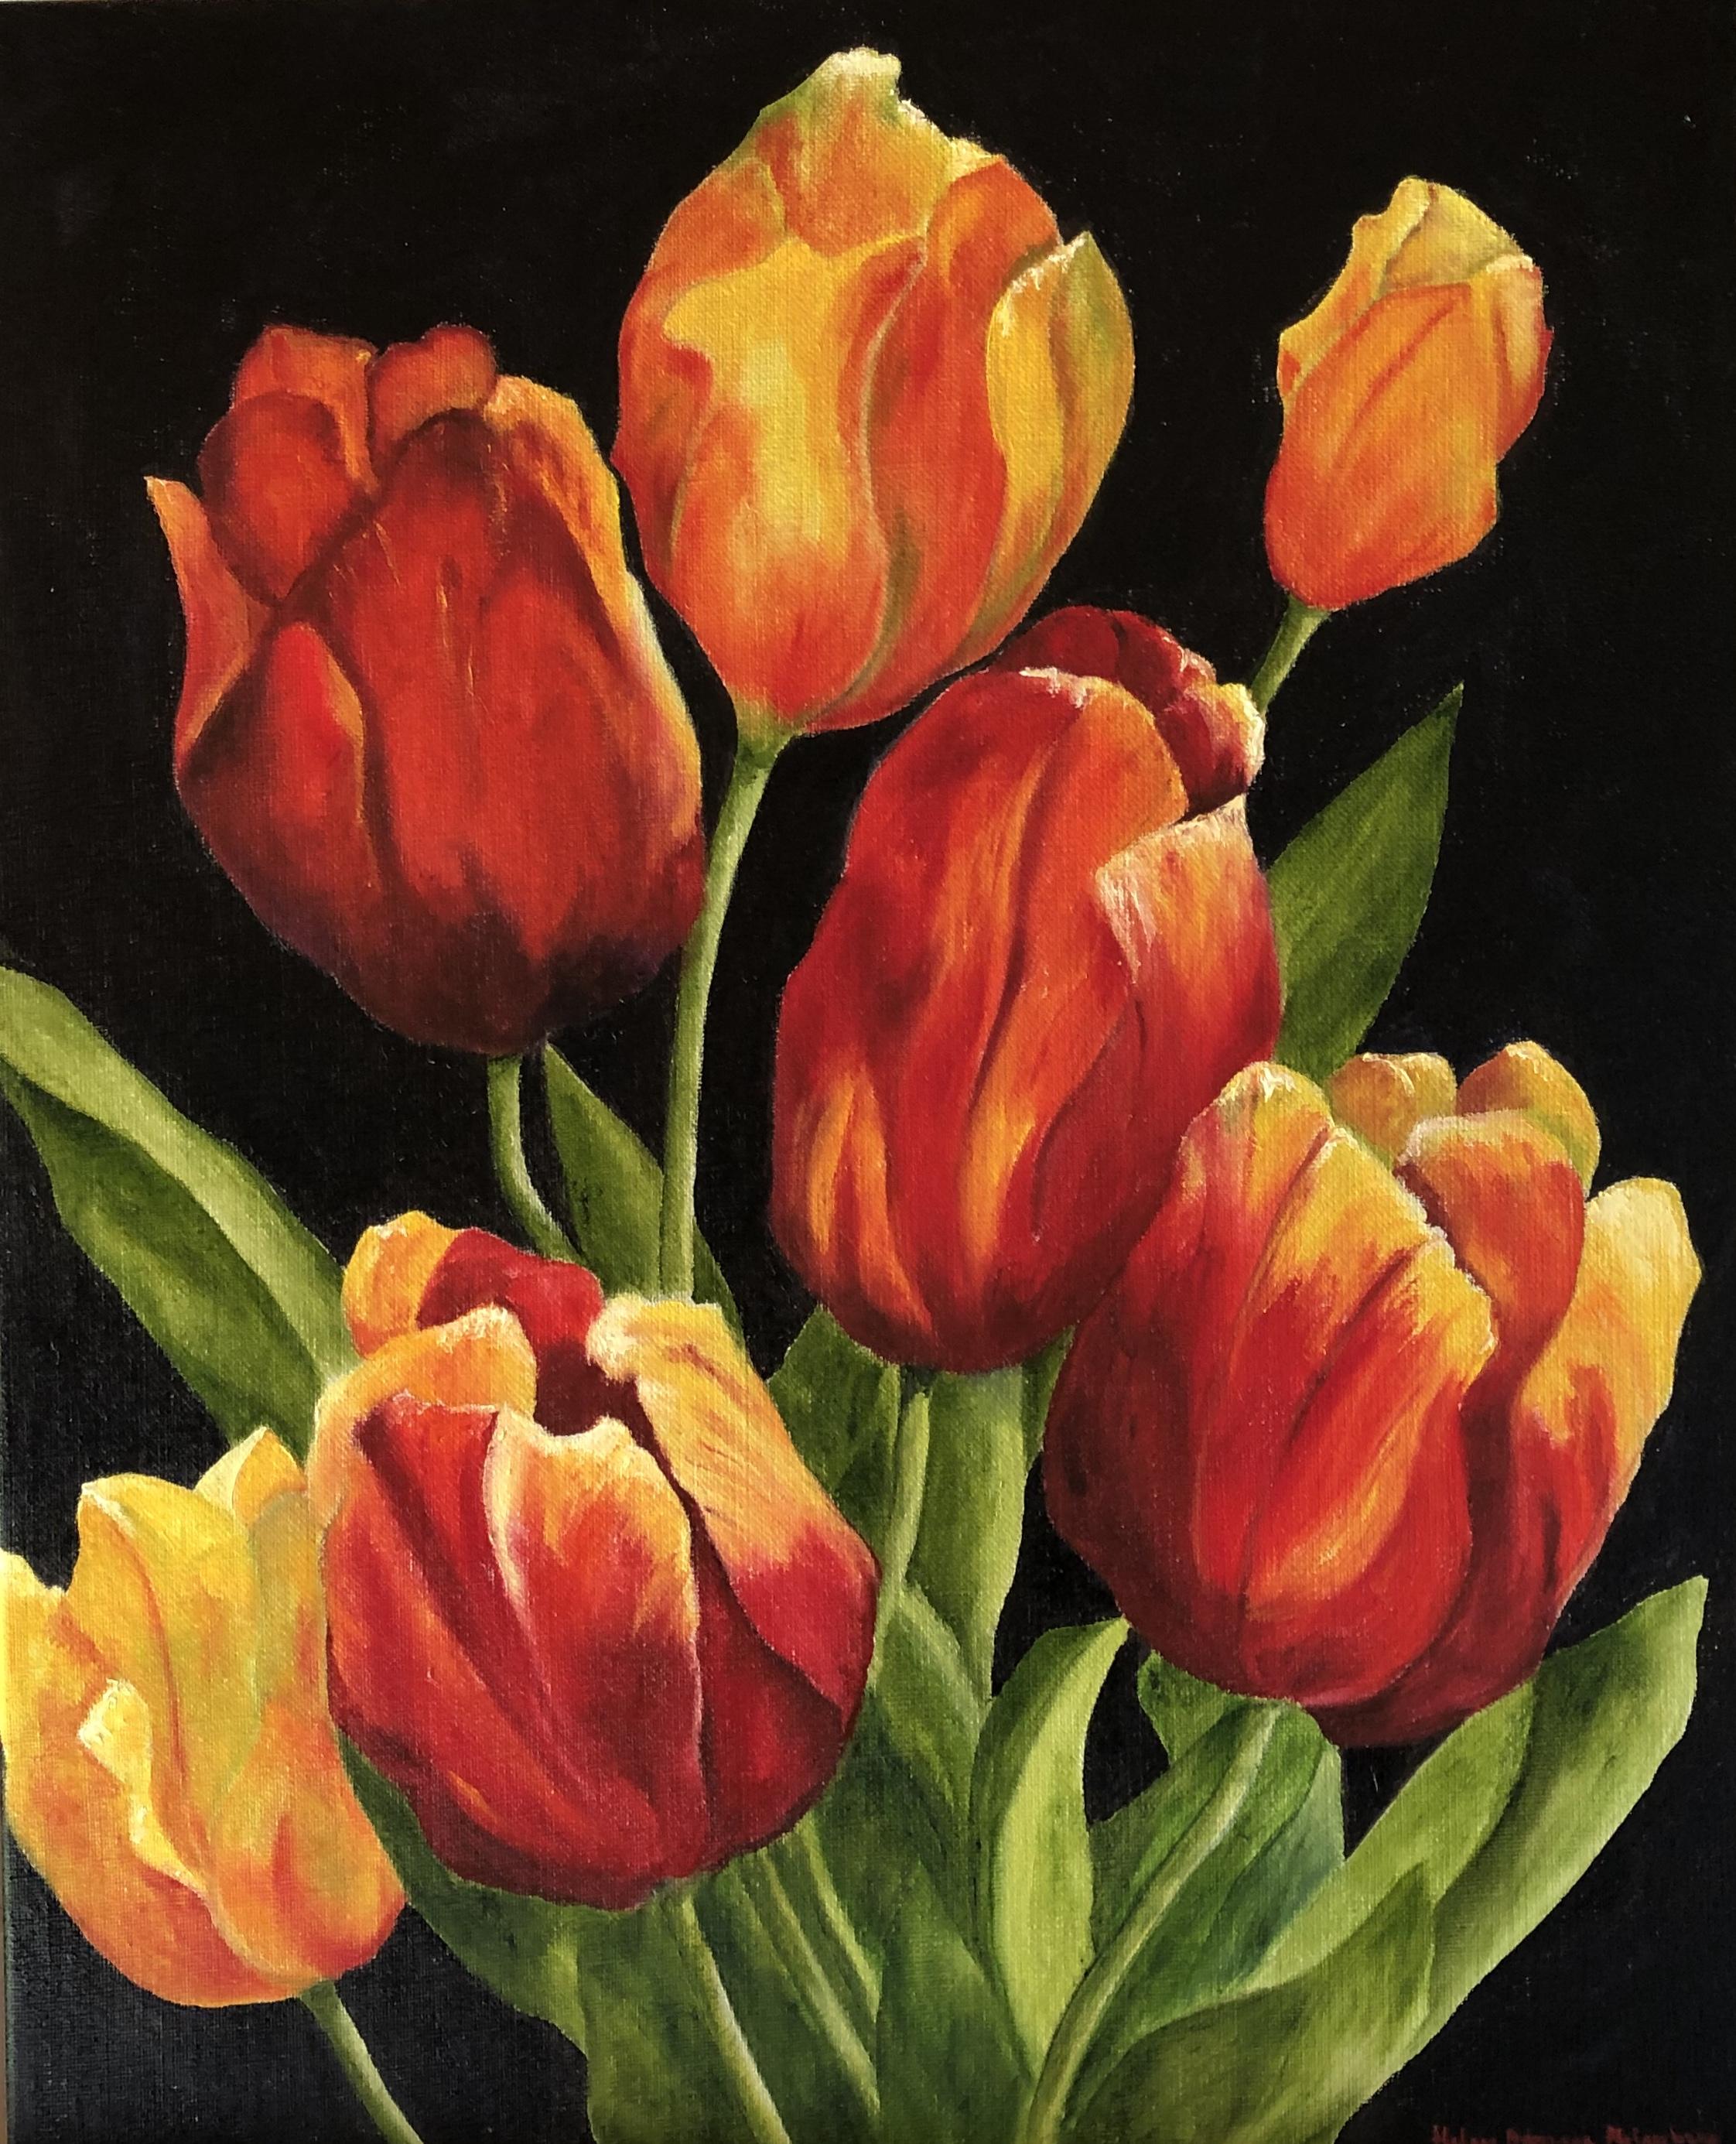 De rödaste tulpaner - 739